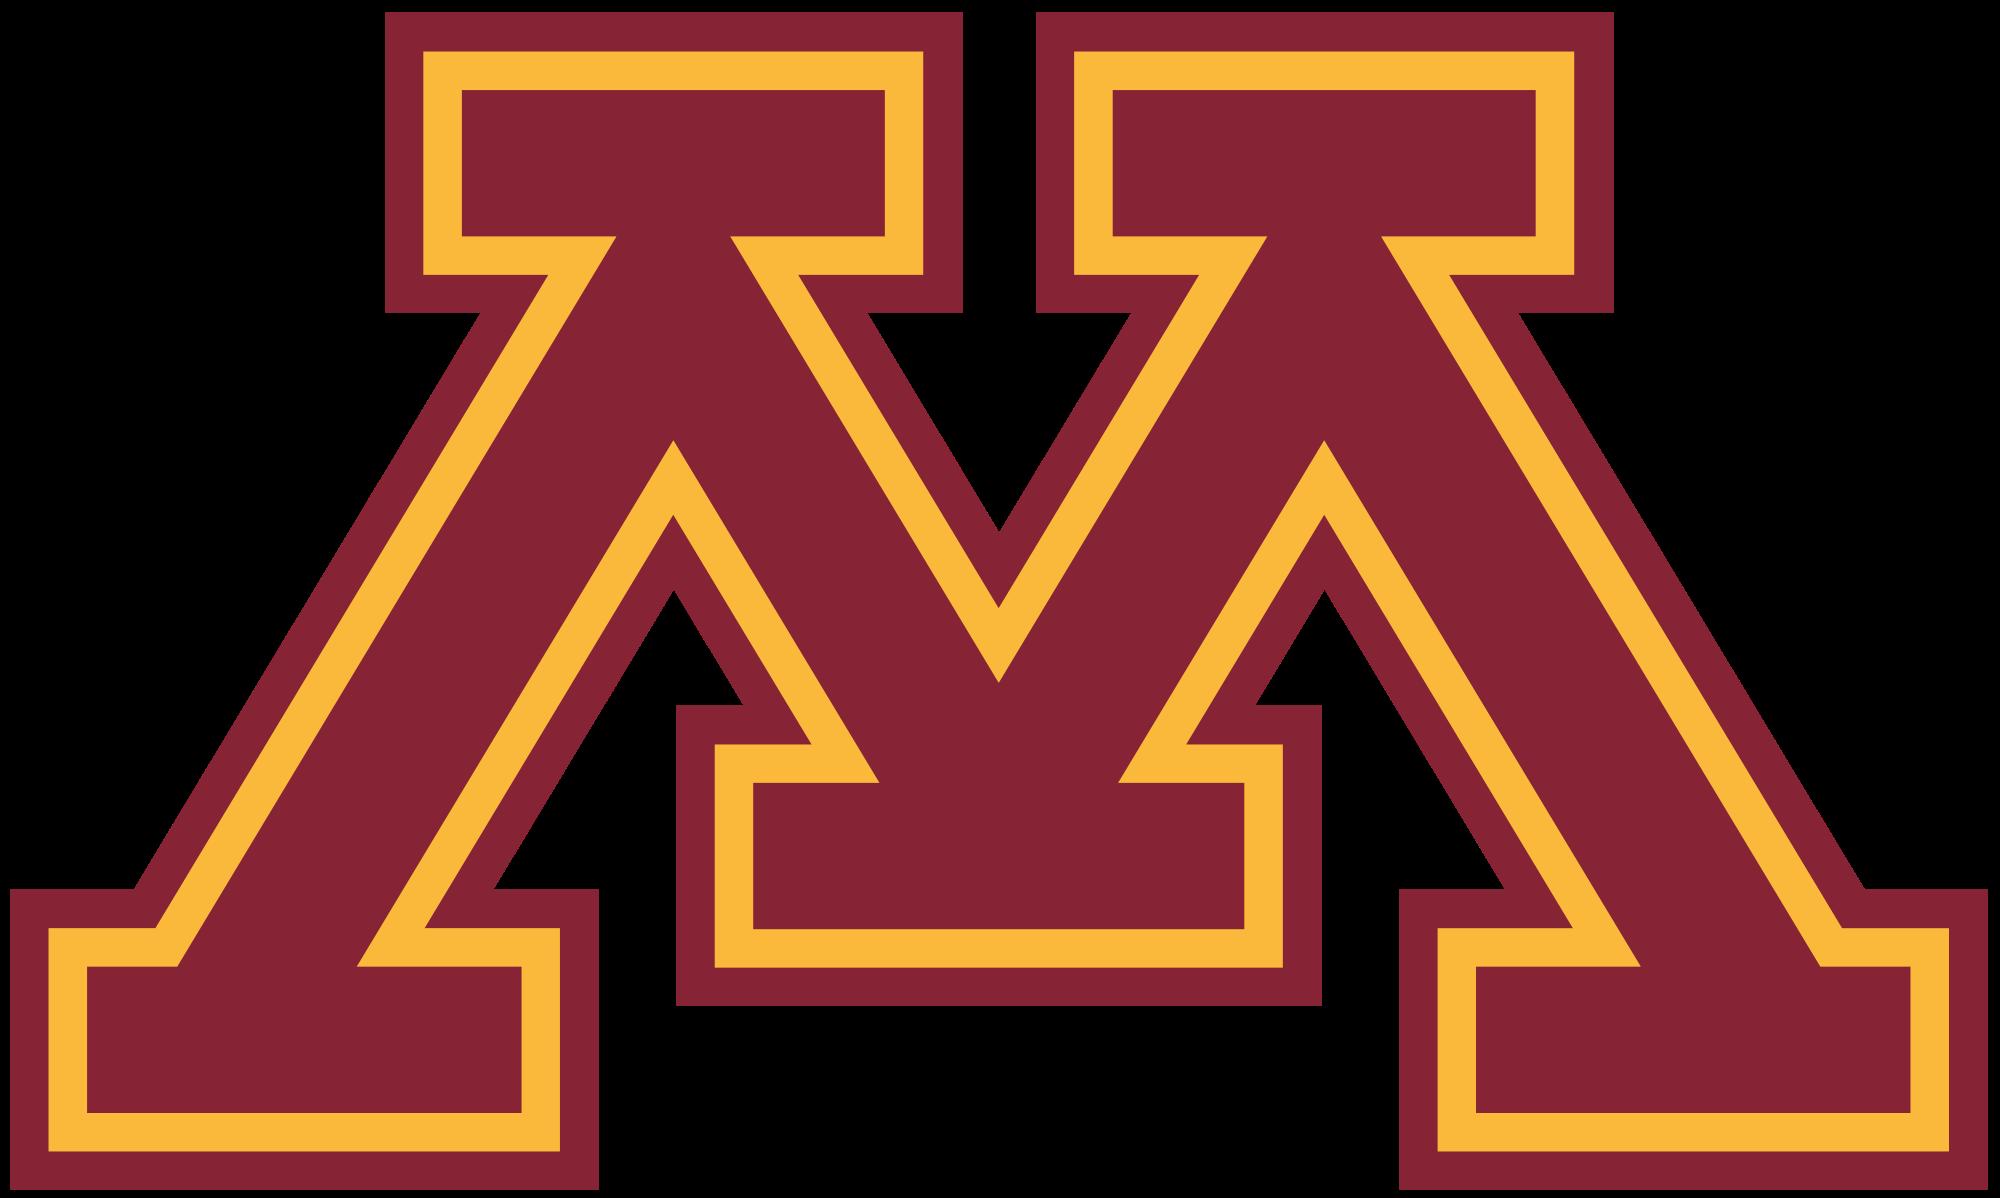 U of m football clipart jpg stock Minnesota Golden Gophers football - Wikipedia jpg stock